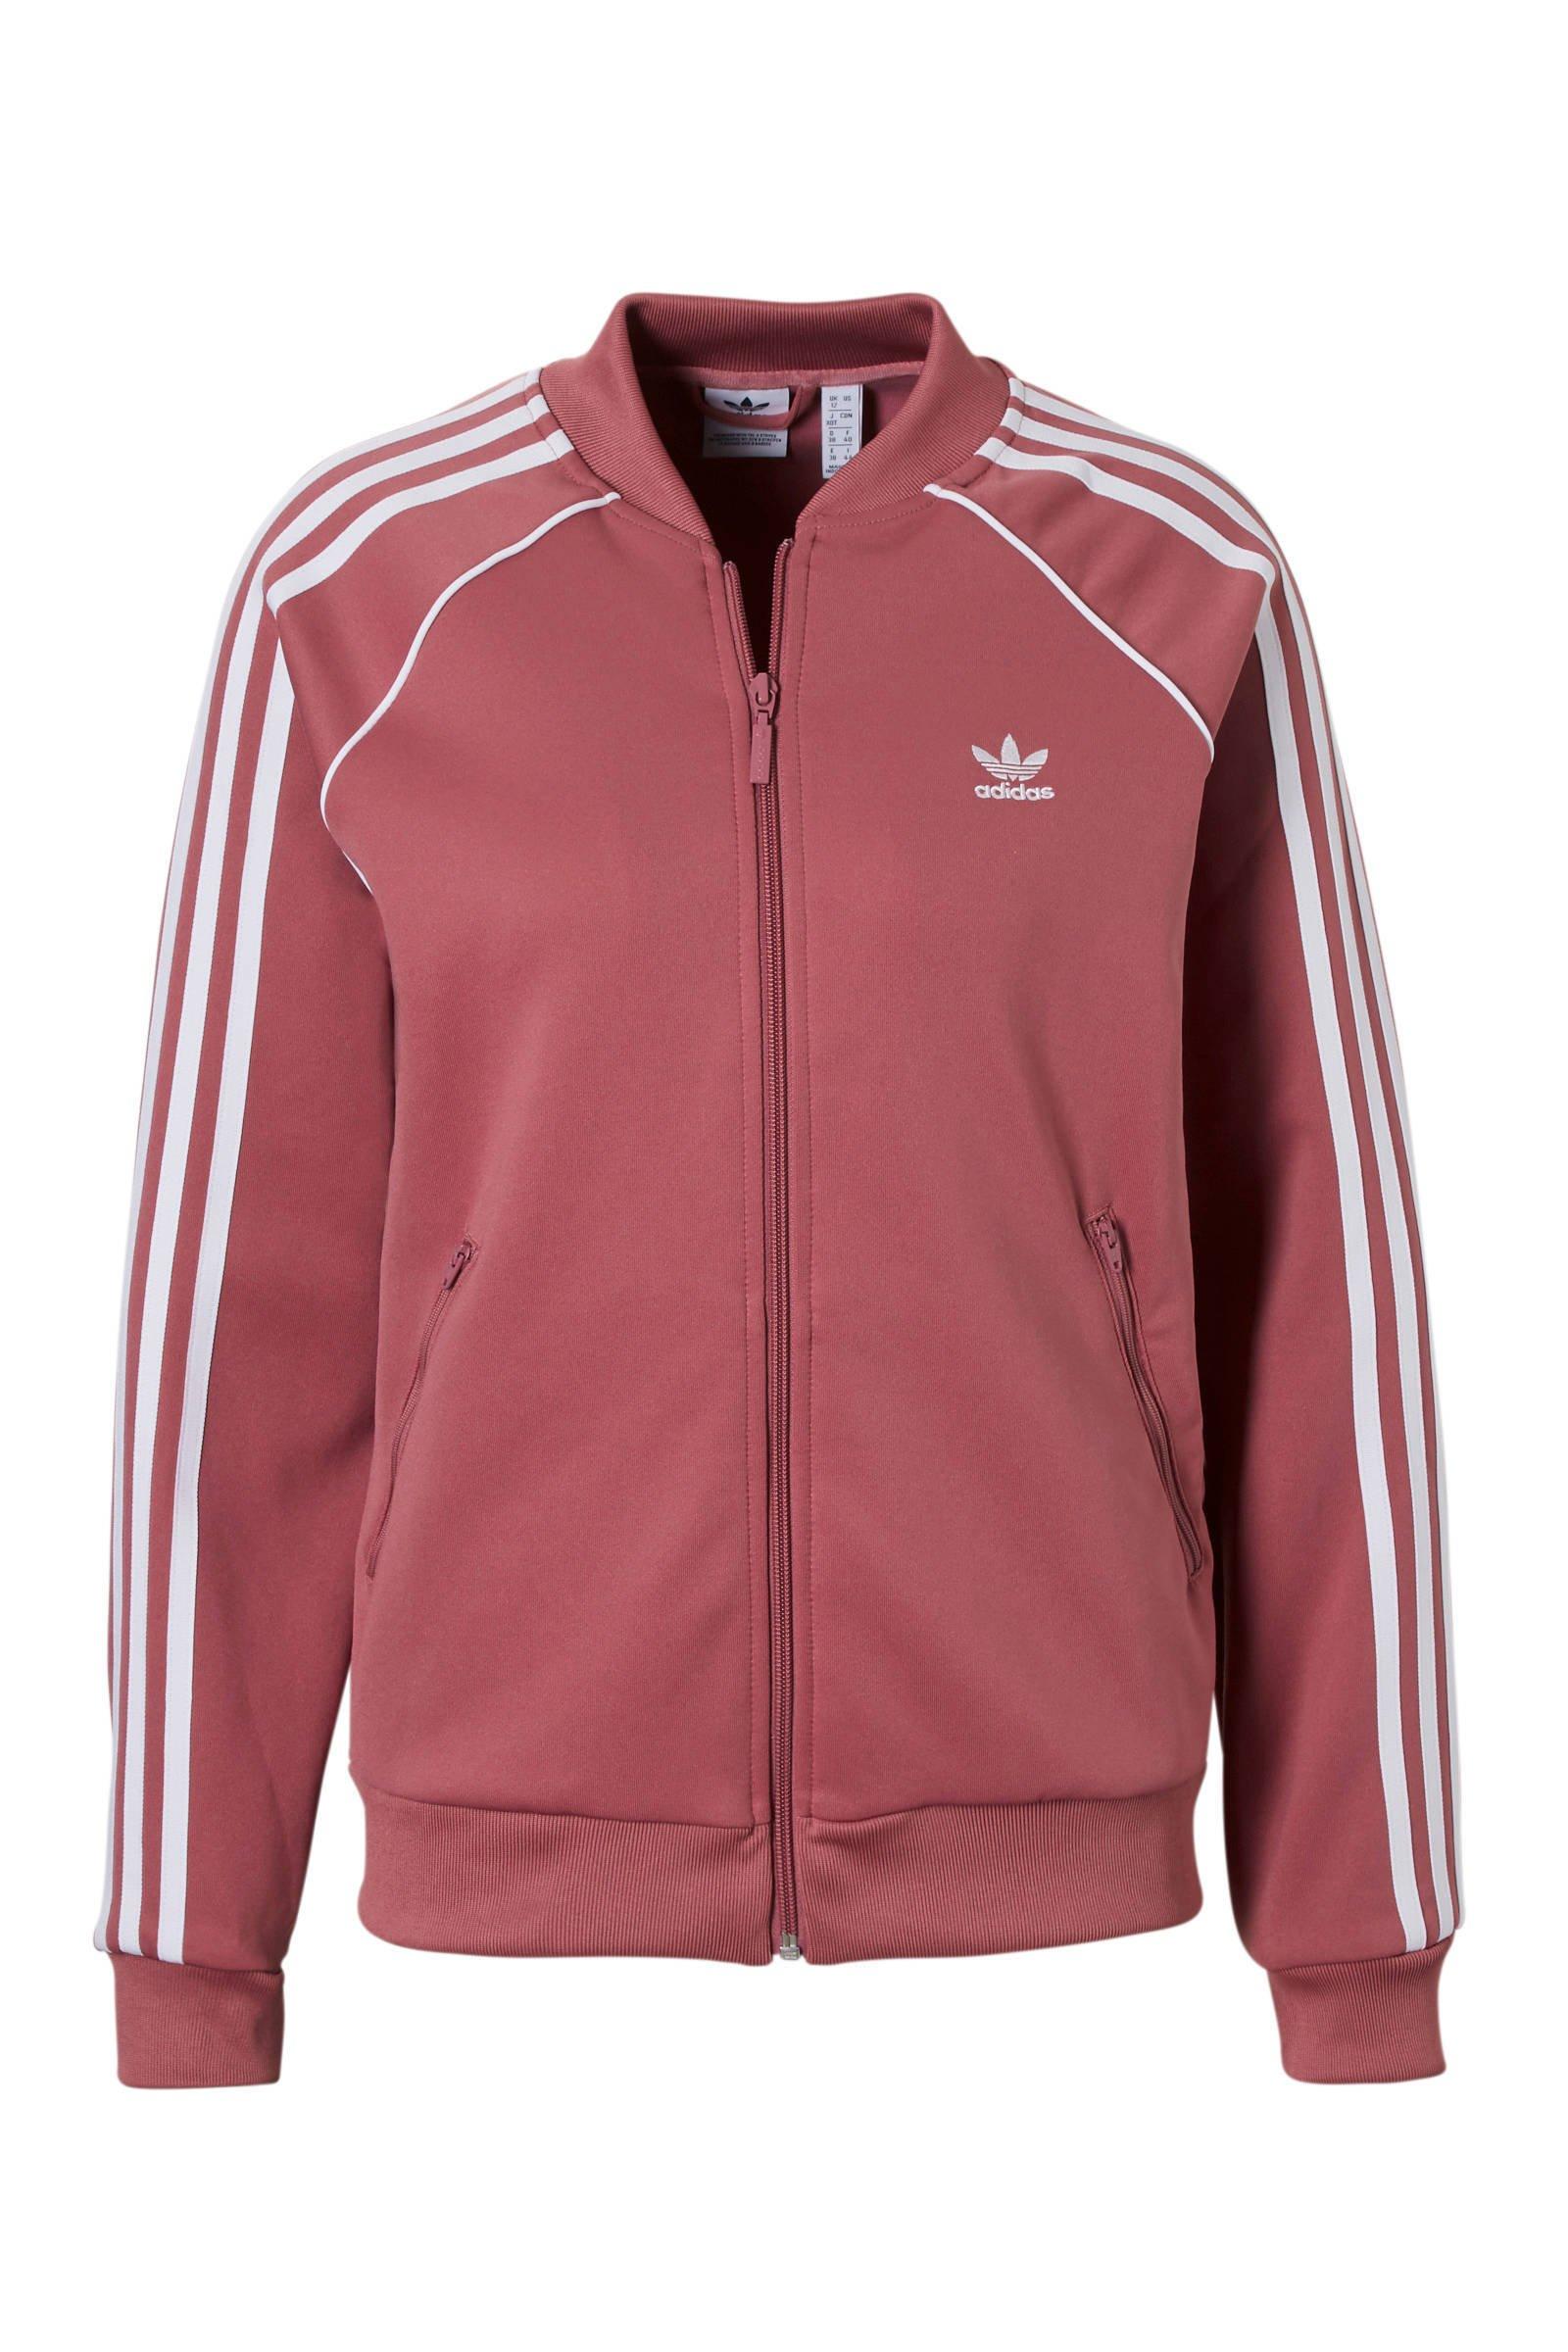 adidas Originals vest oudroze | wehkamp